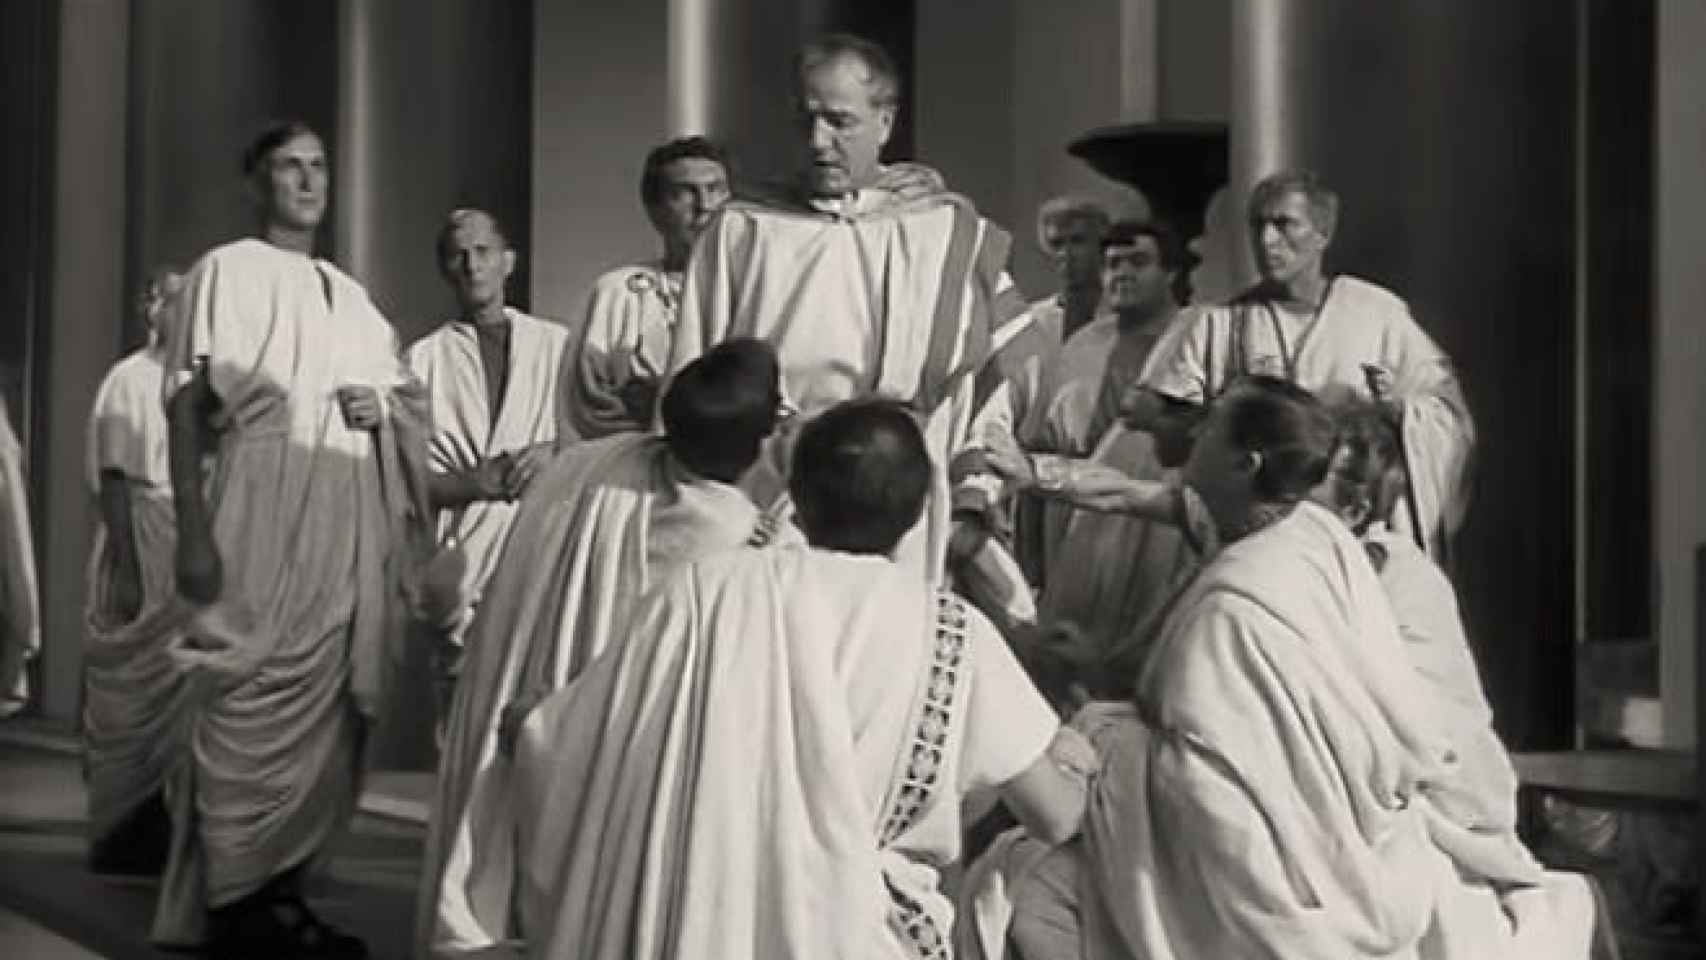 Cadre du film 'Julio César' (1953). Scène de meurtre.'Julio César' (1953). Escena del asesinato.